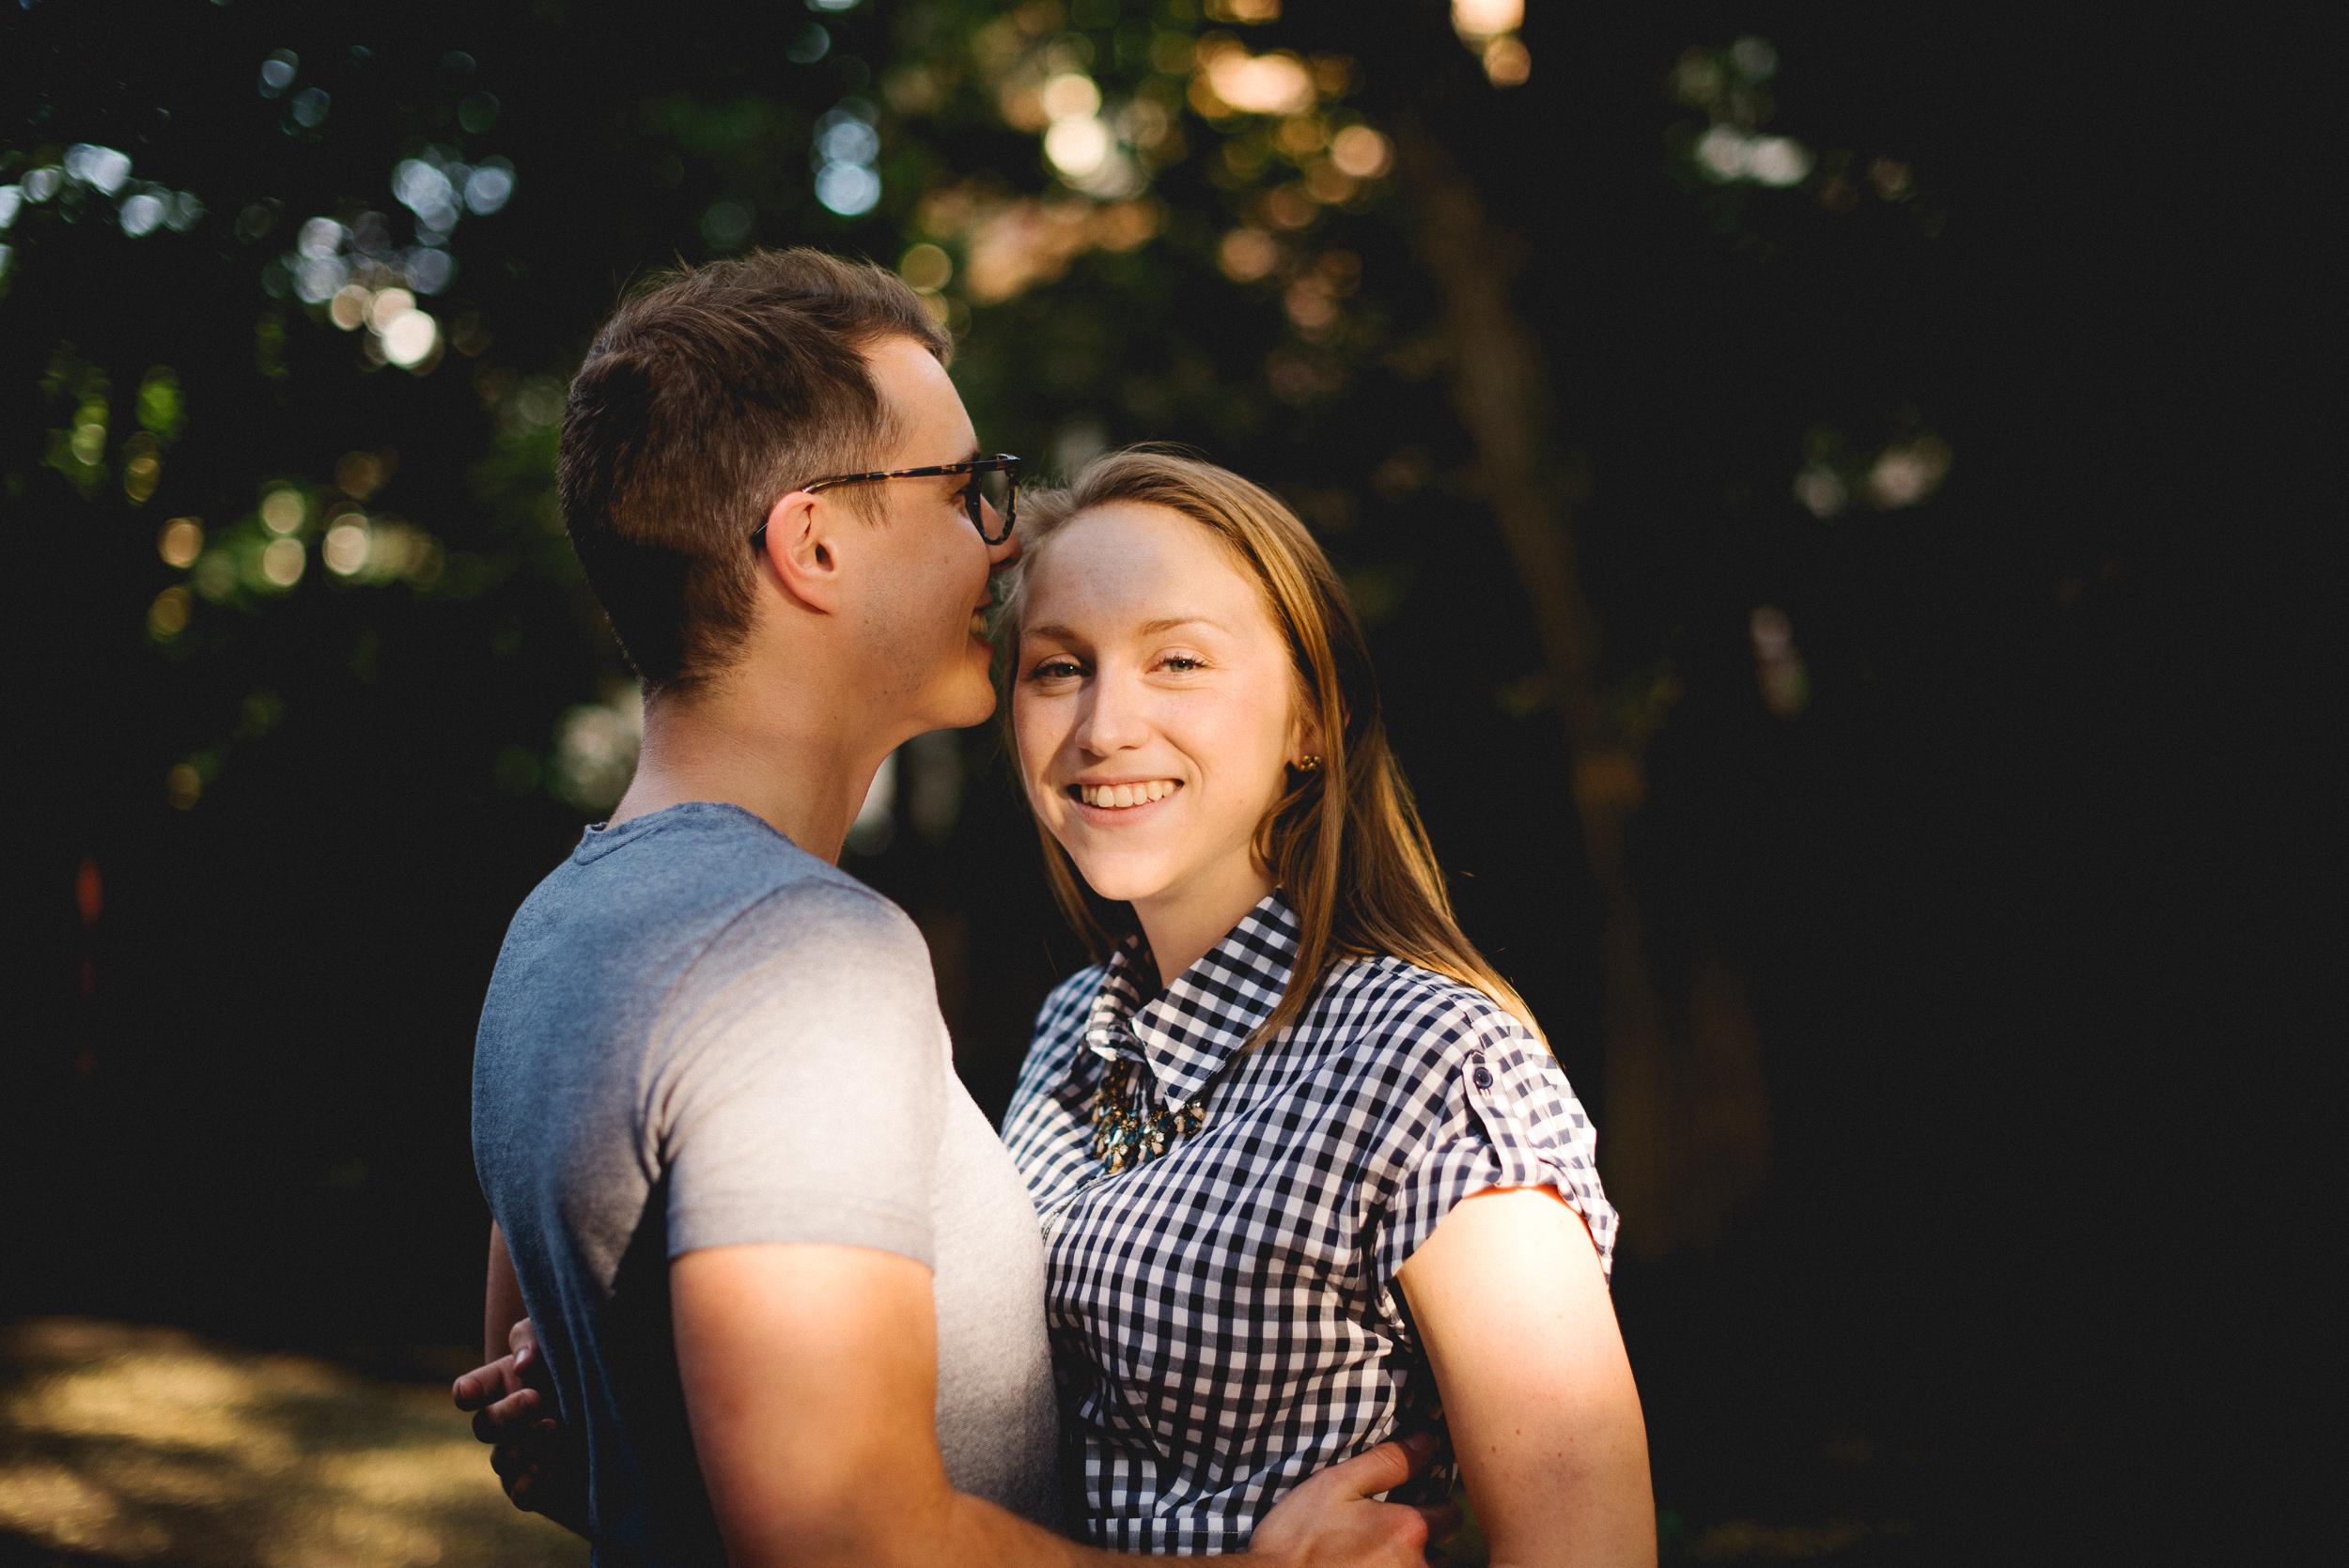 Peaberry-Photography-Society-Hill-Philadelphia-Pennsylvania-Newlyweds-Just-Married-025.jpg